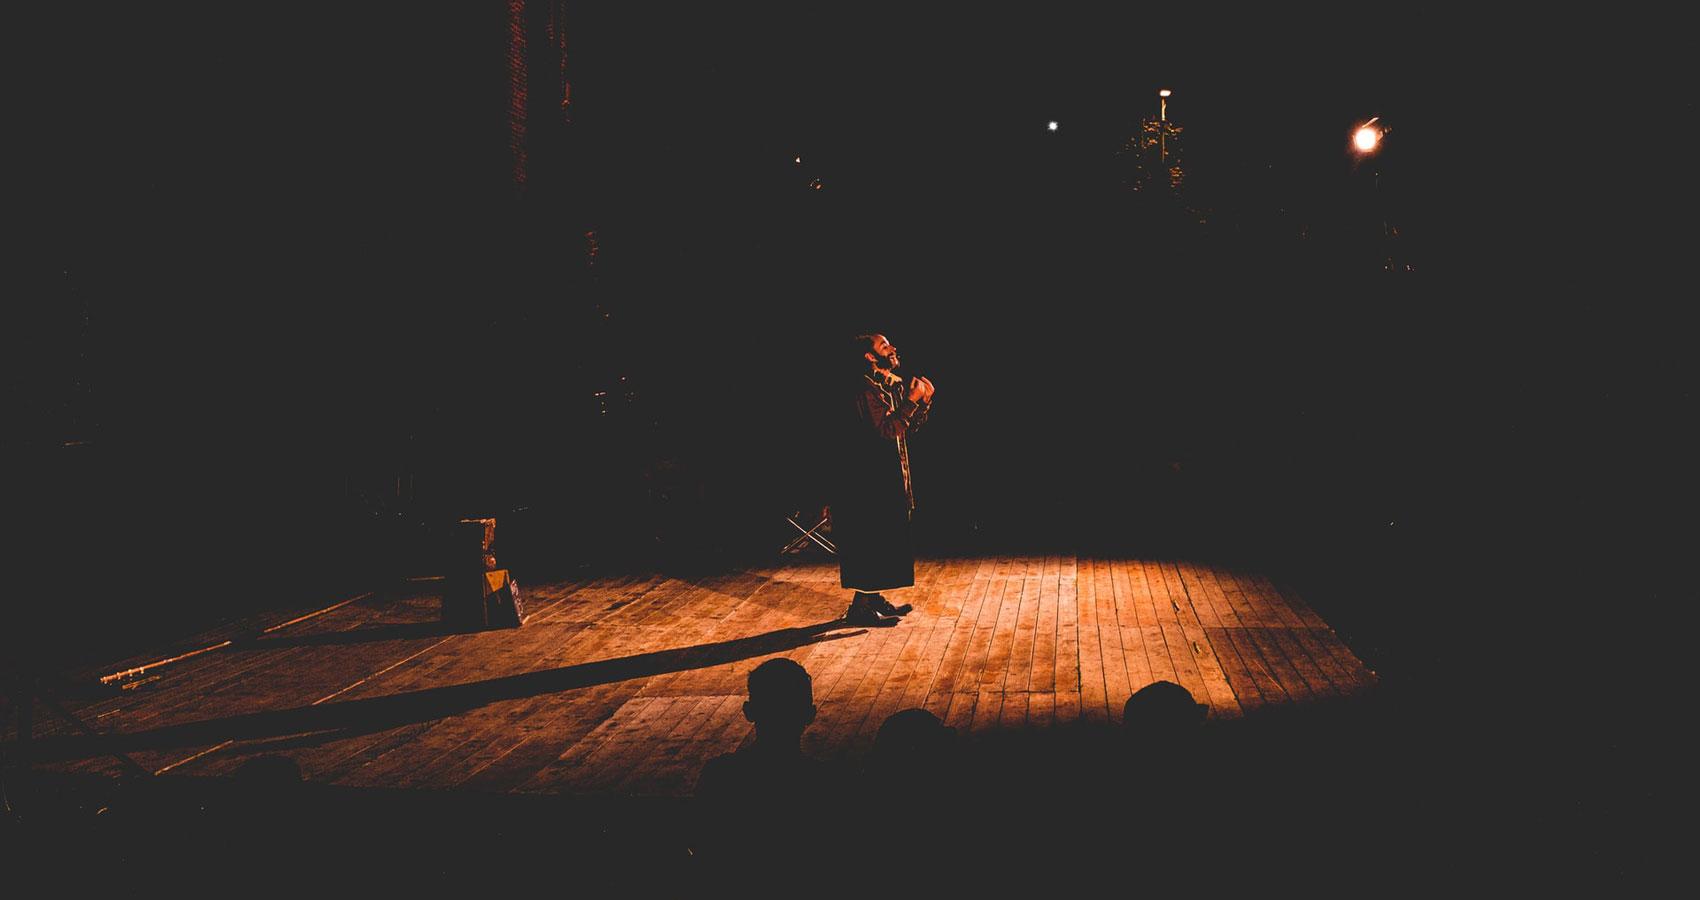 The Stage, a poem by Bozena Mazur-Nowak at Spillwords.com